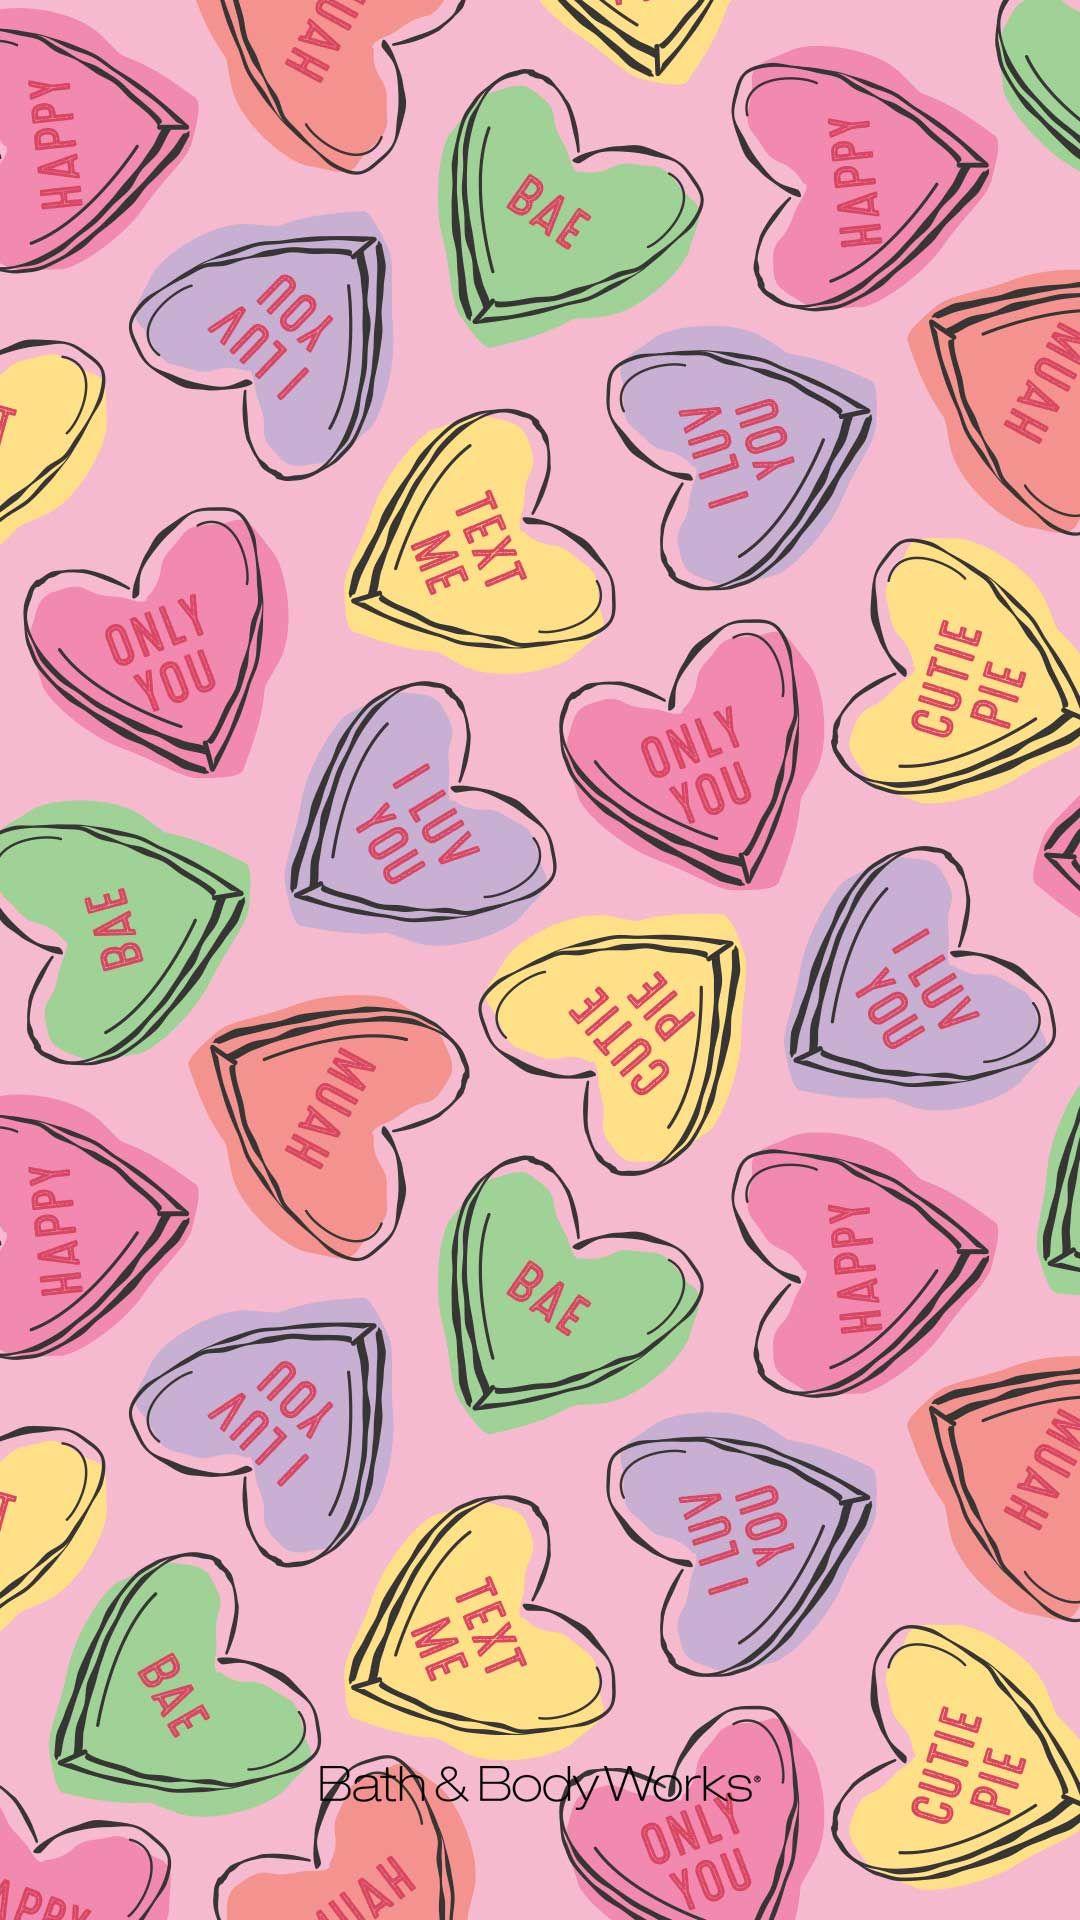 Heart Phone Wallpaper In 2021 Valentines Wallpaper Iphone Valentines Wallpaper Cute Patterns Wallpaper